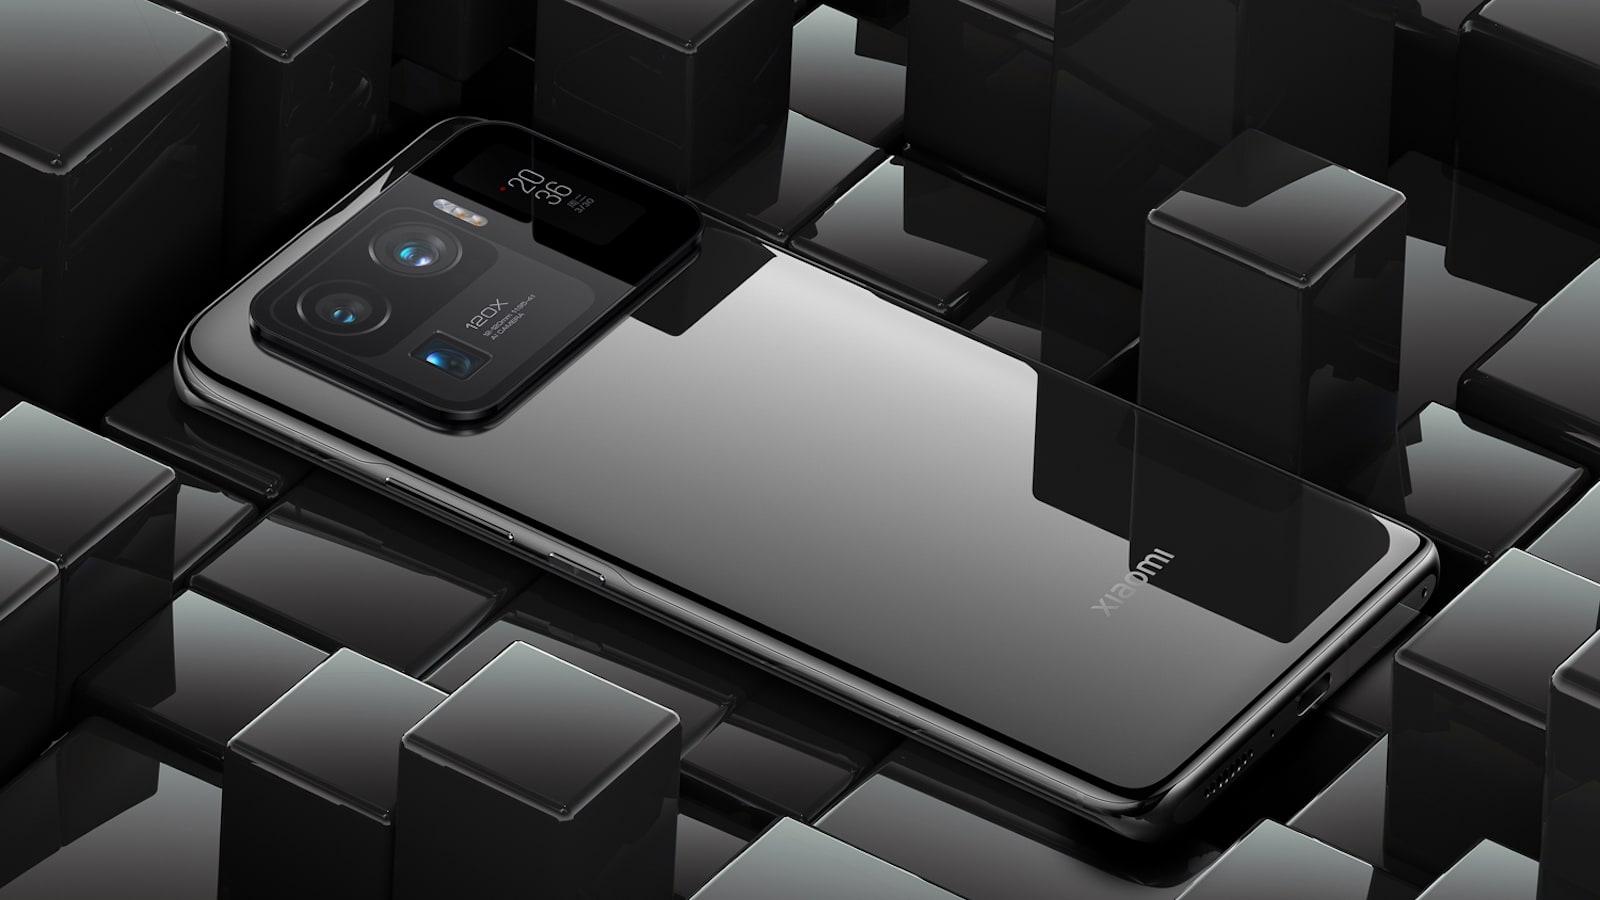 Xiaomi Mi 11 Ultra photography smartphone features a Samsung GN2 large camera sensor